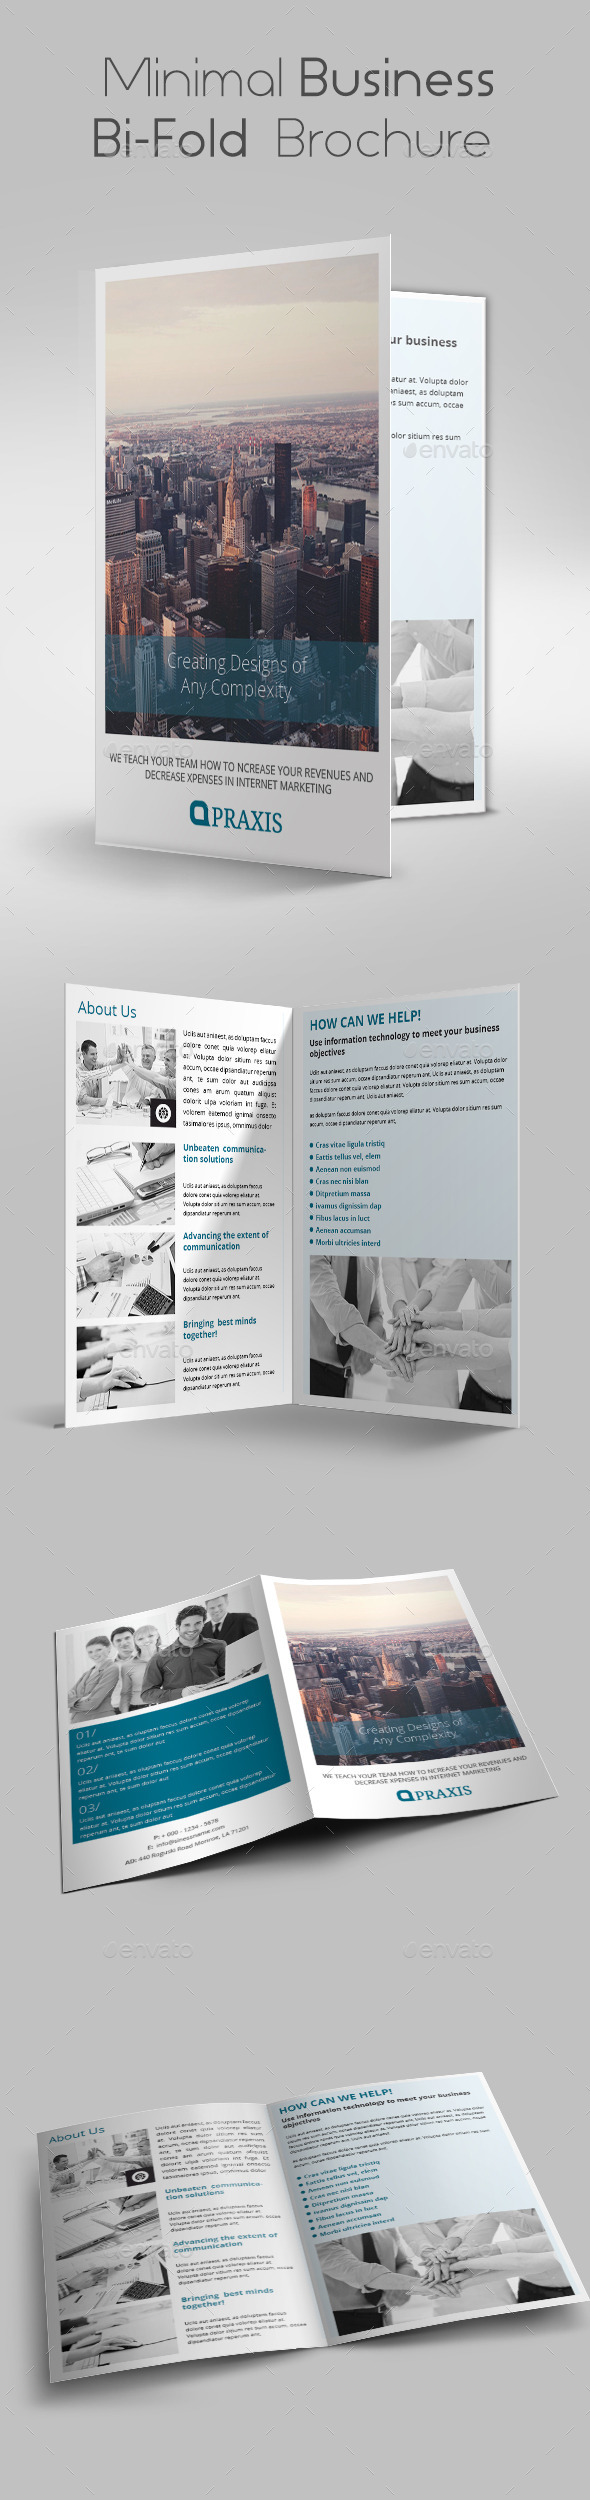 Minimal Business Bi-Fold Brochure - Corporate Brochures